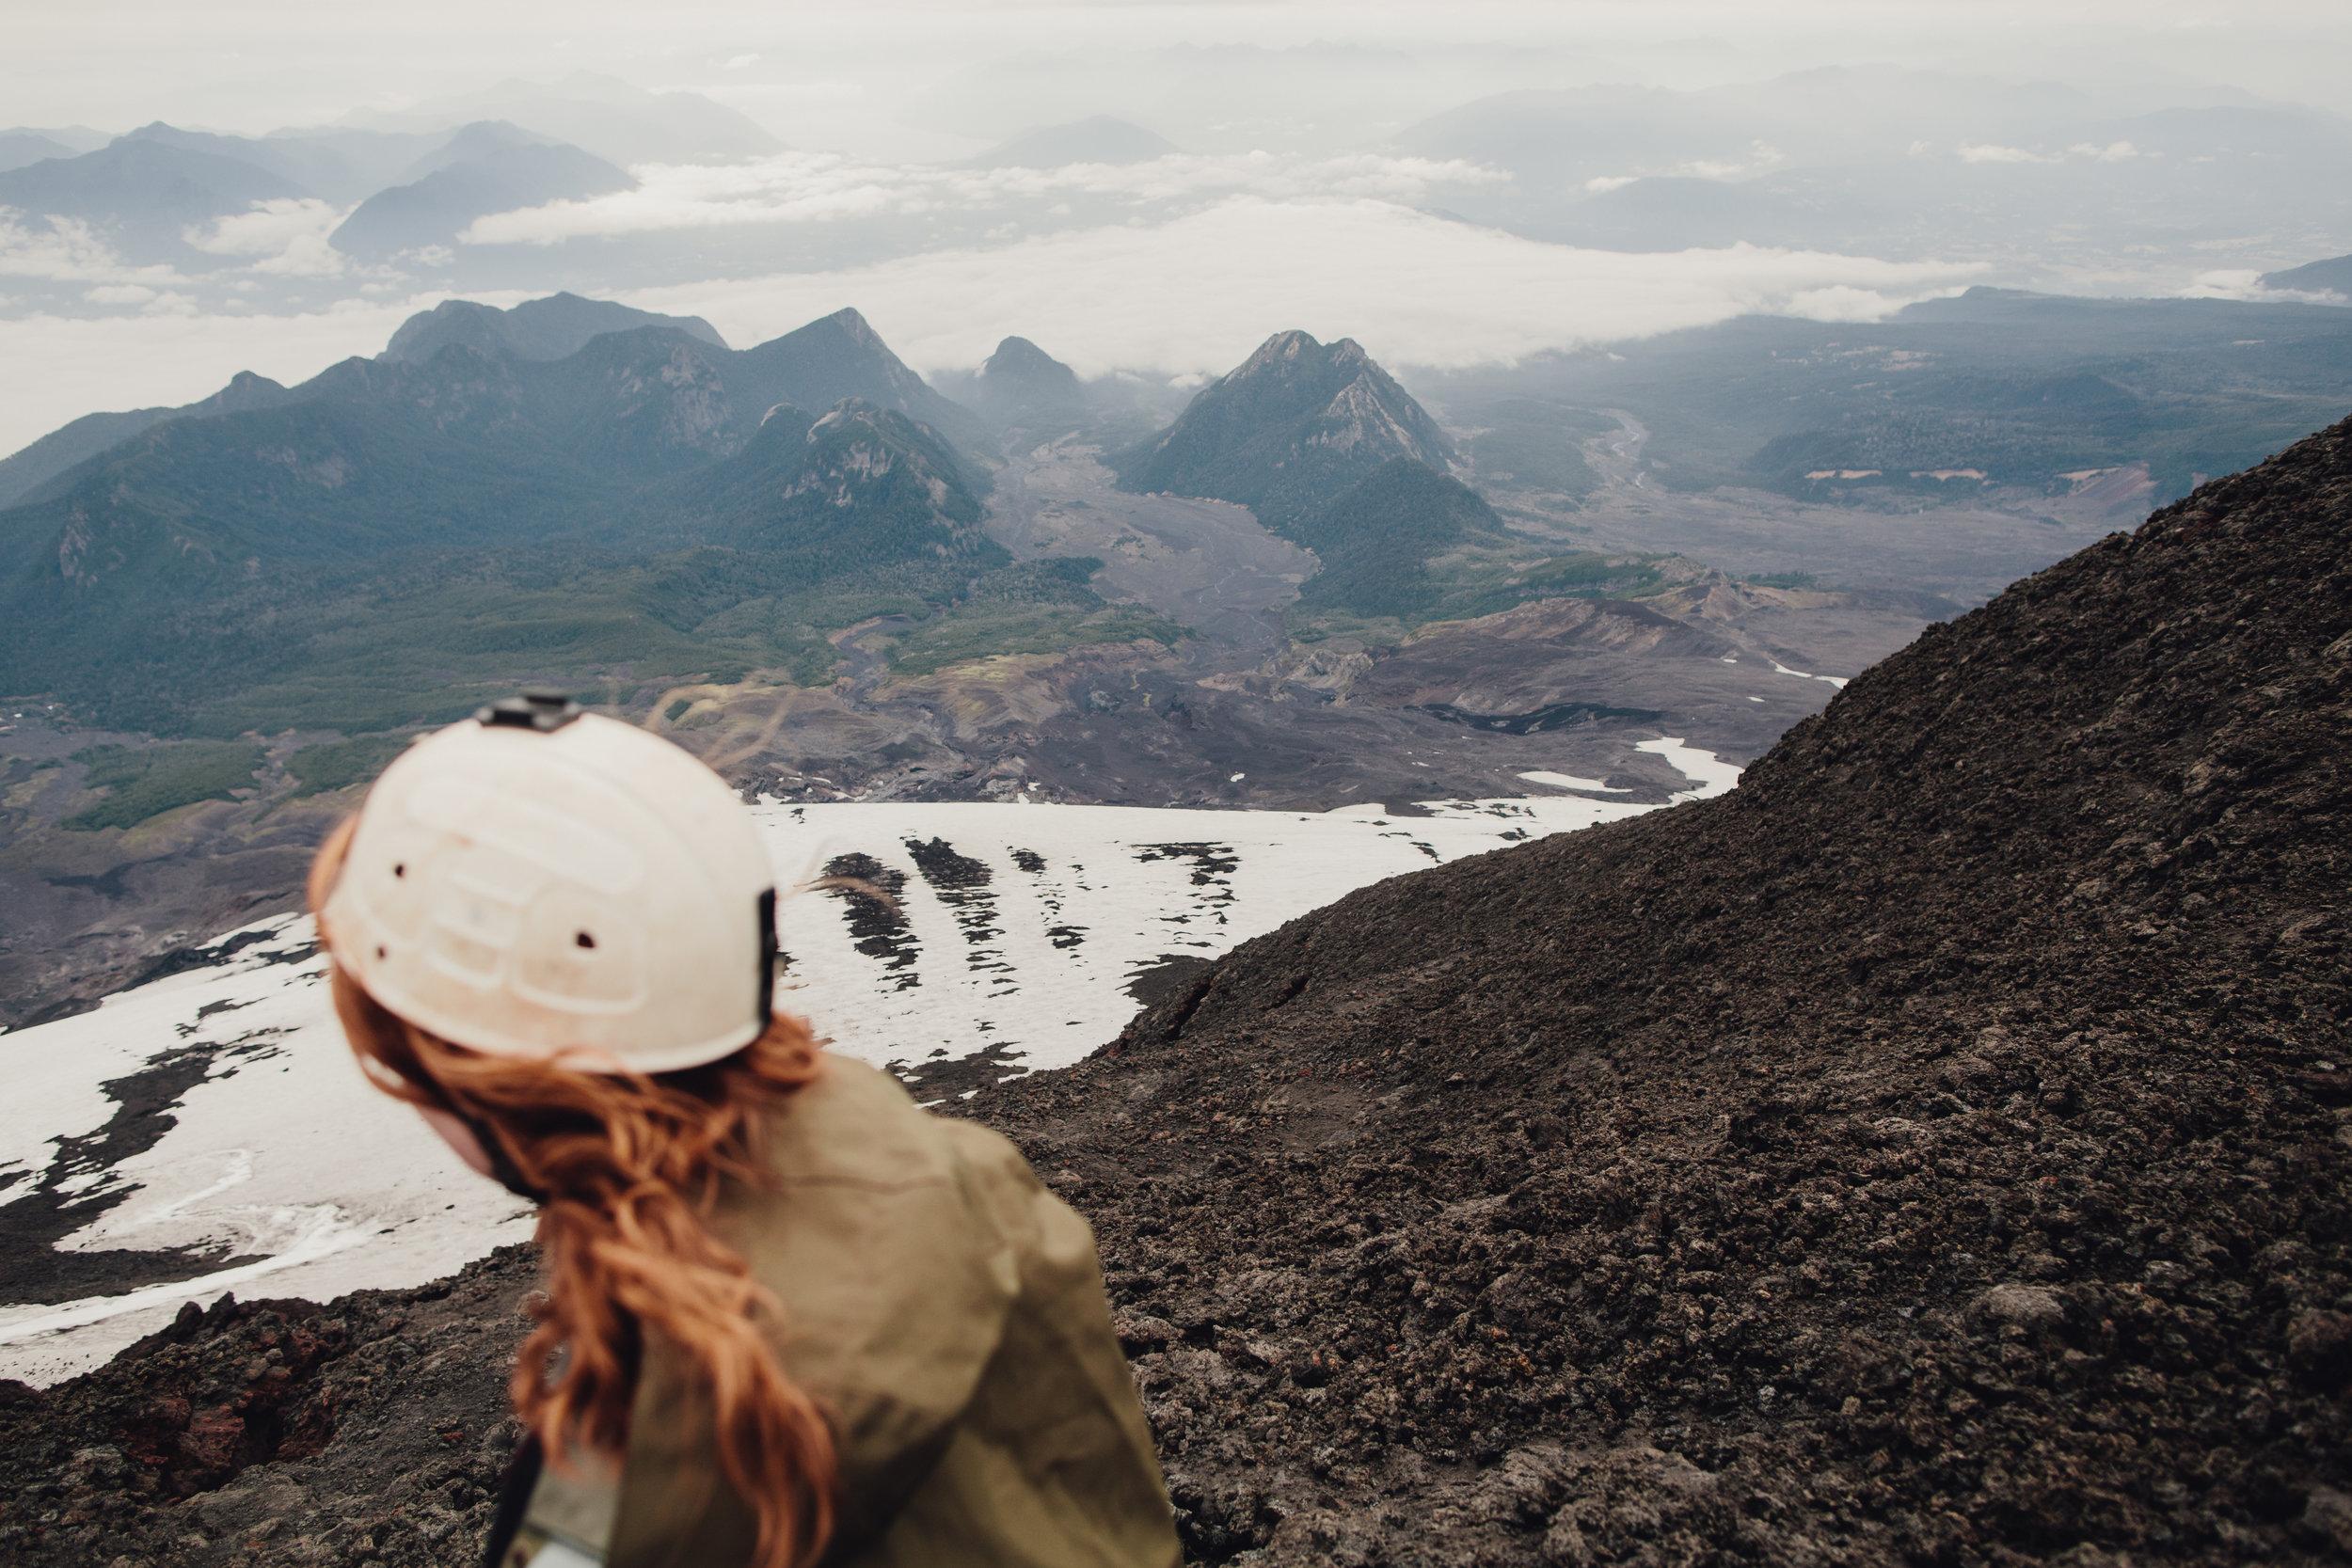 villarrica-volcano-trek-pucon-chile-0010.jpg